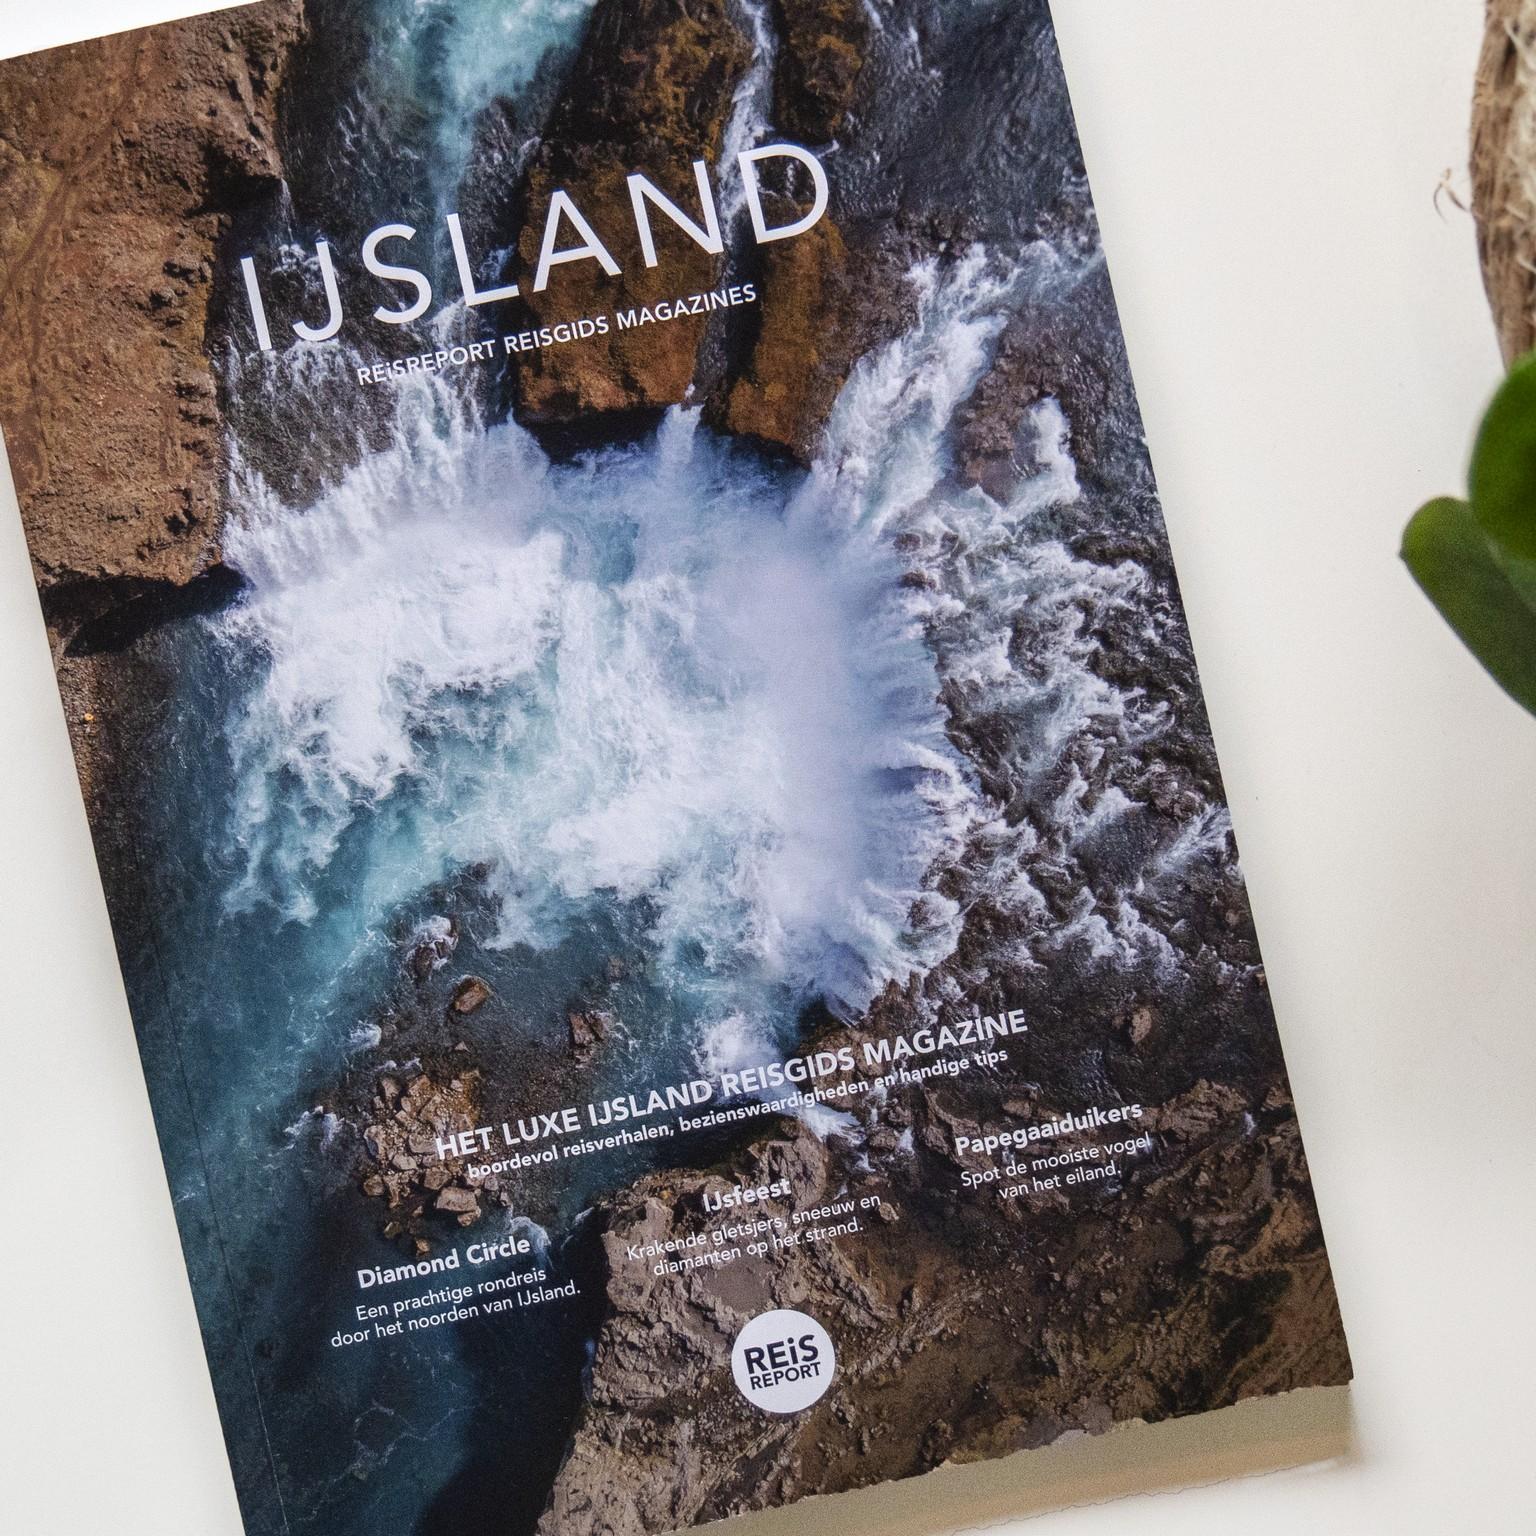 ijsland reisgids magazine